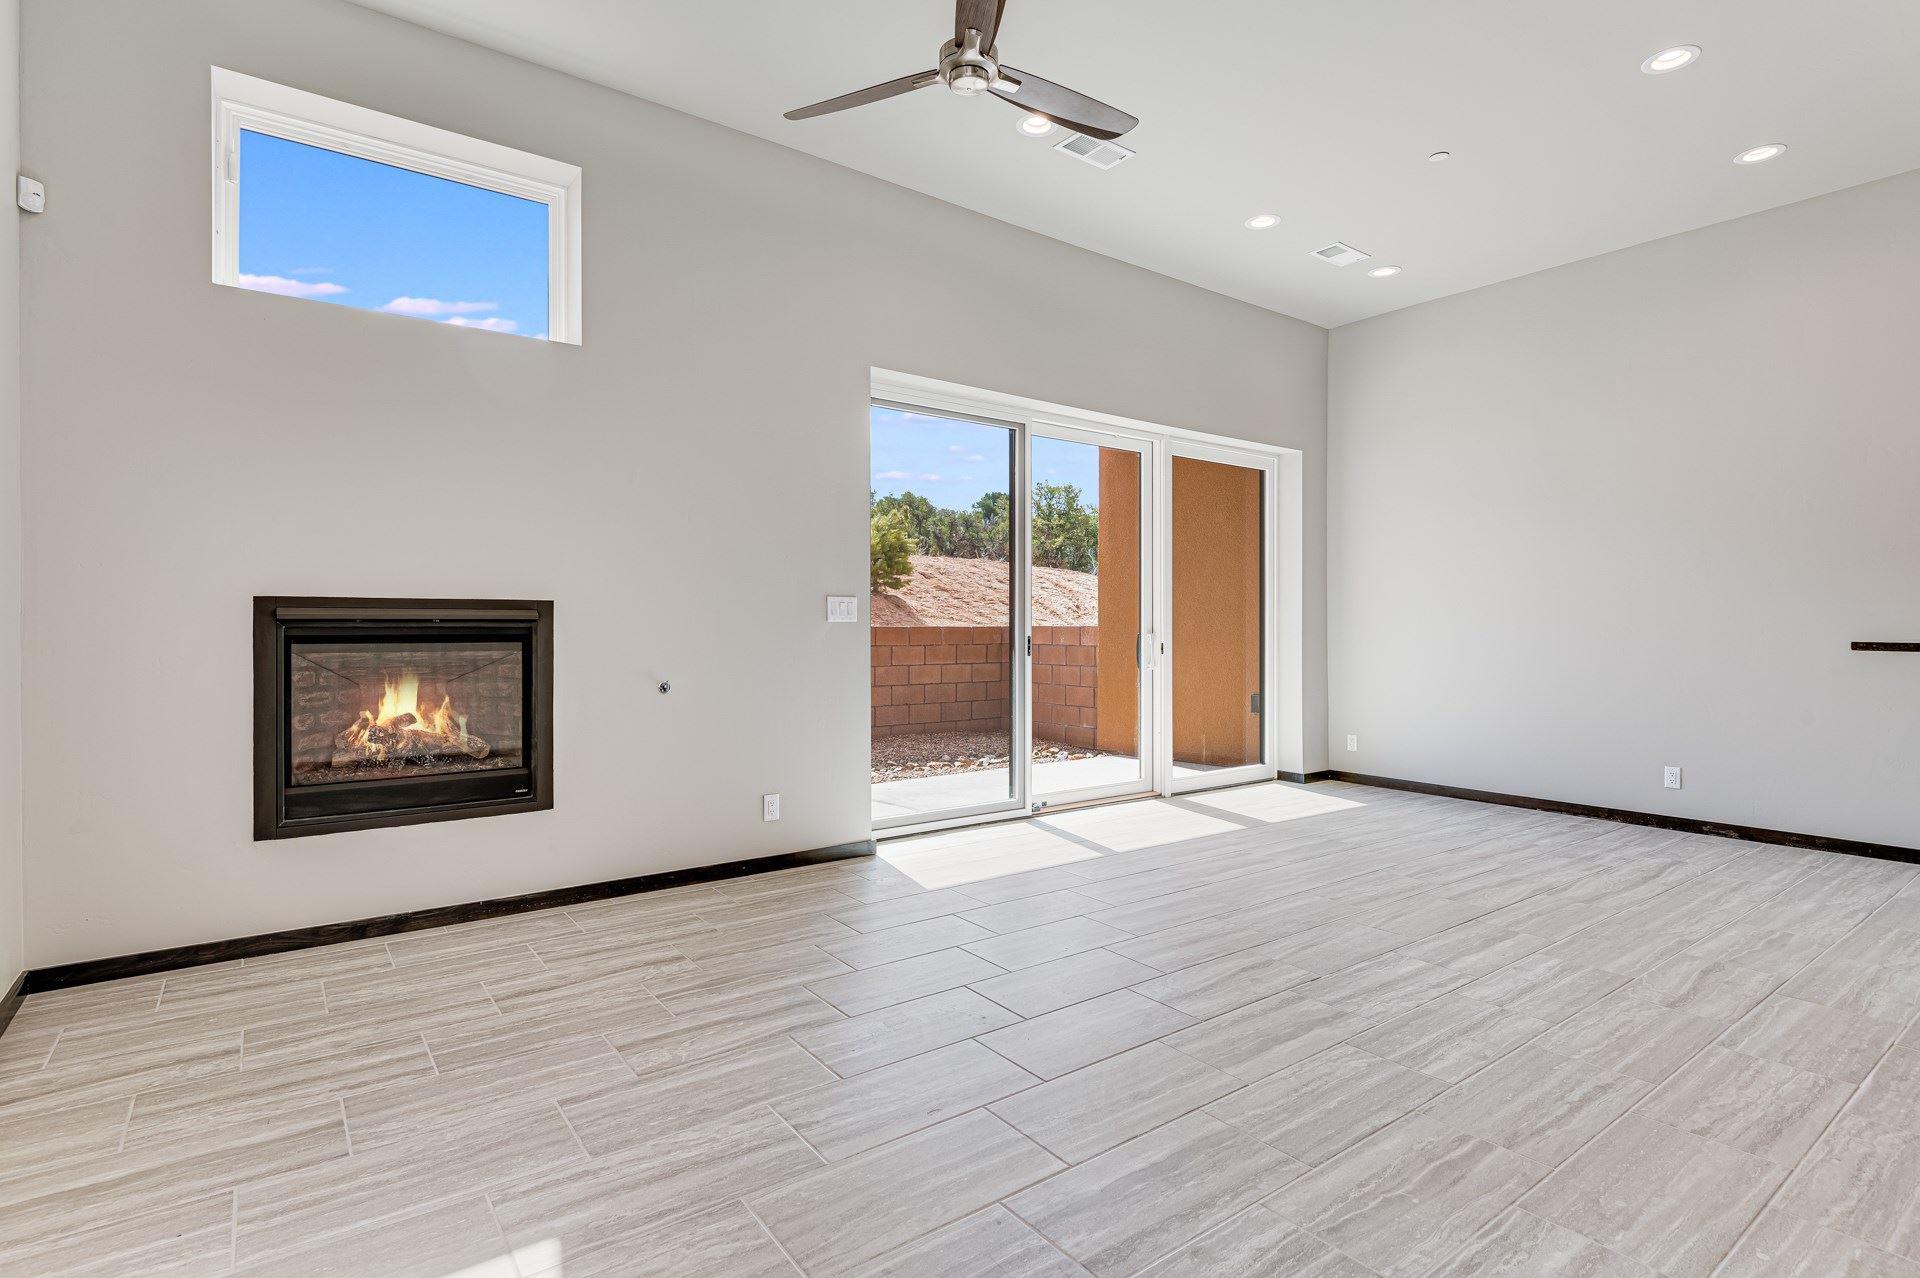 Photo for 1501 Avenida Rincon #102, Santa Fe, NM 87506 (MLS # 201901498)